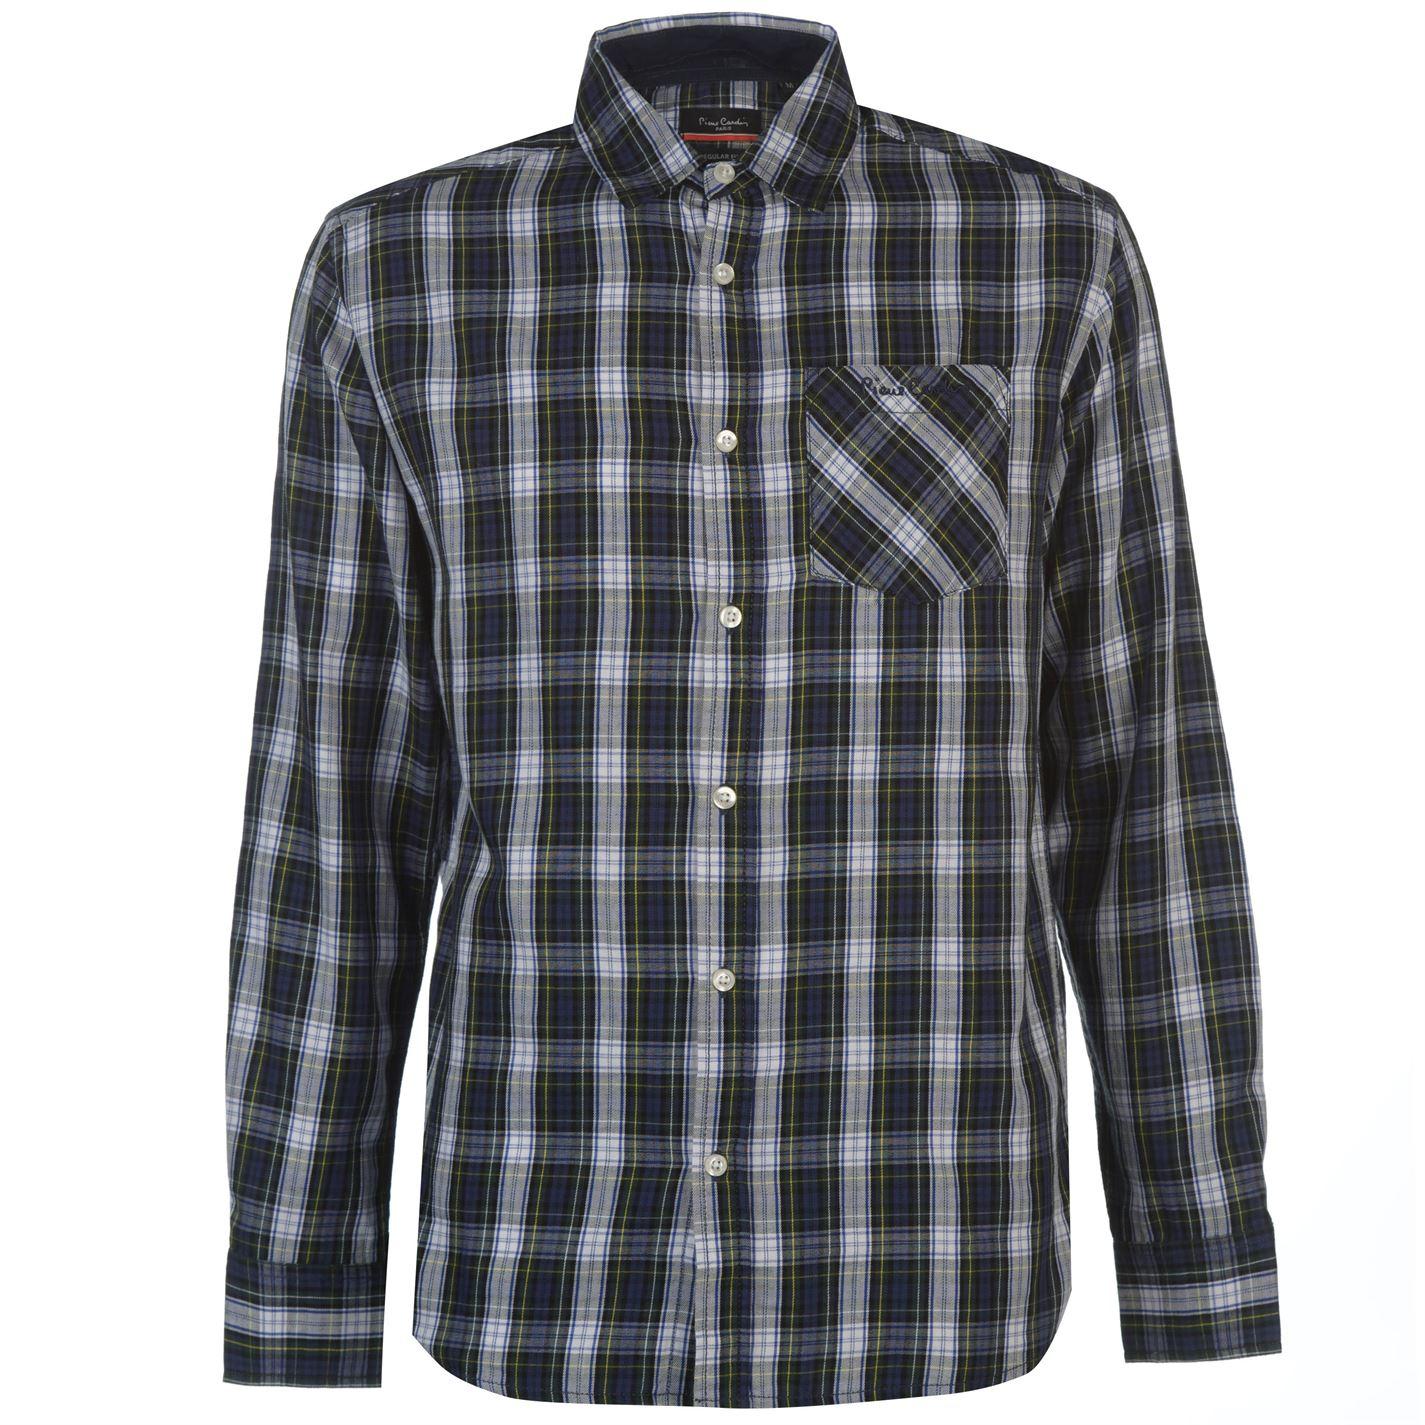 Pierre Cardin Tartan Check Long Sleeve Shirt Mens